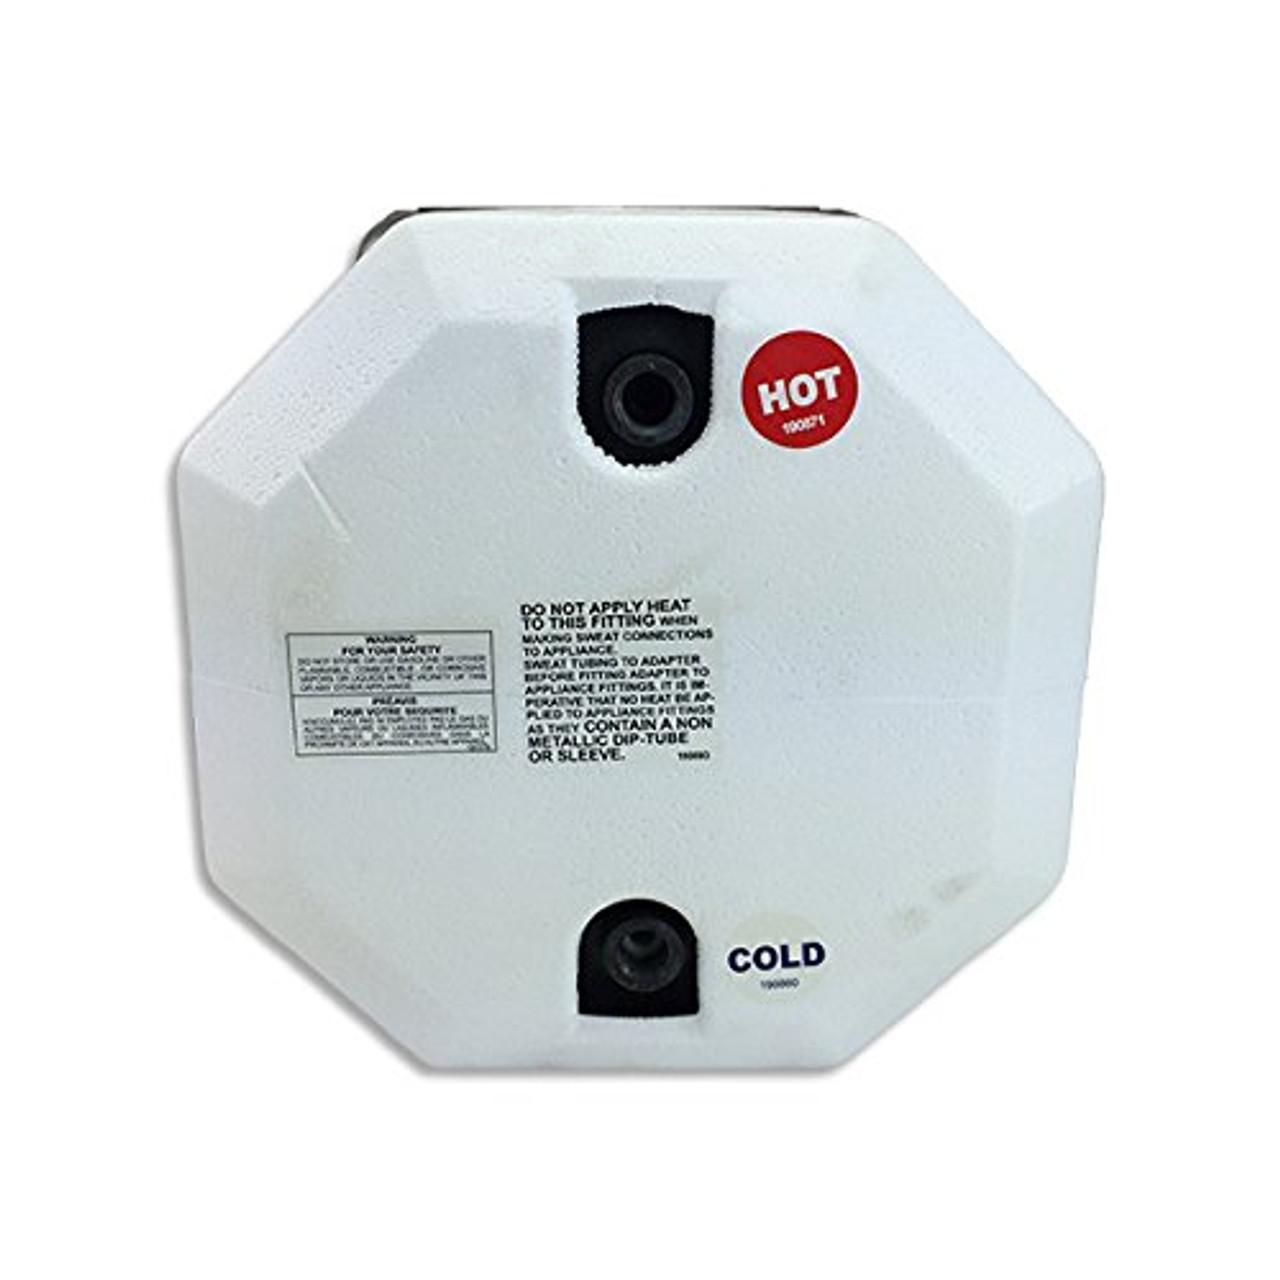 SUBURBAN WATER HEATER-6 GAL. GAS/PILOT (09-1004) REAR VIEW